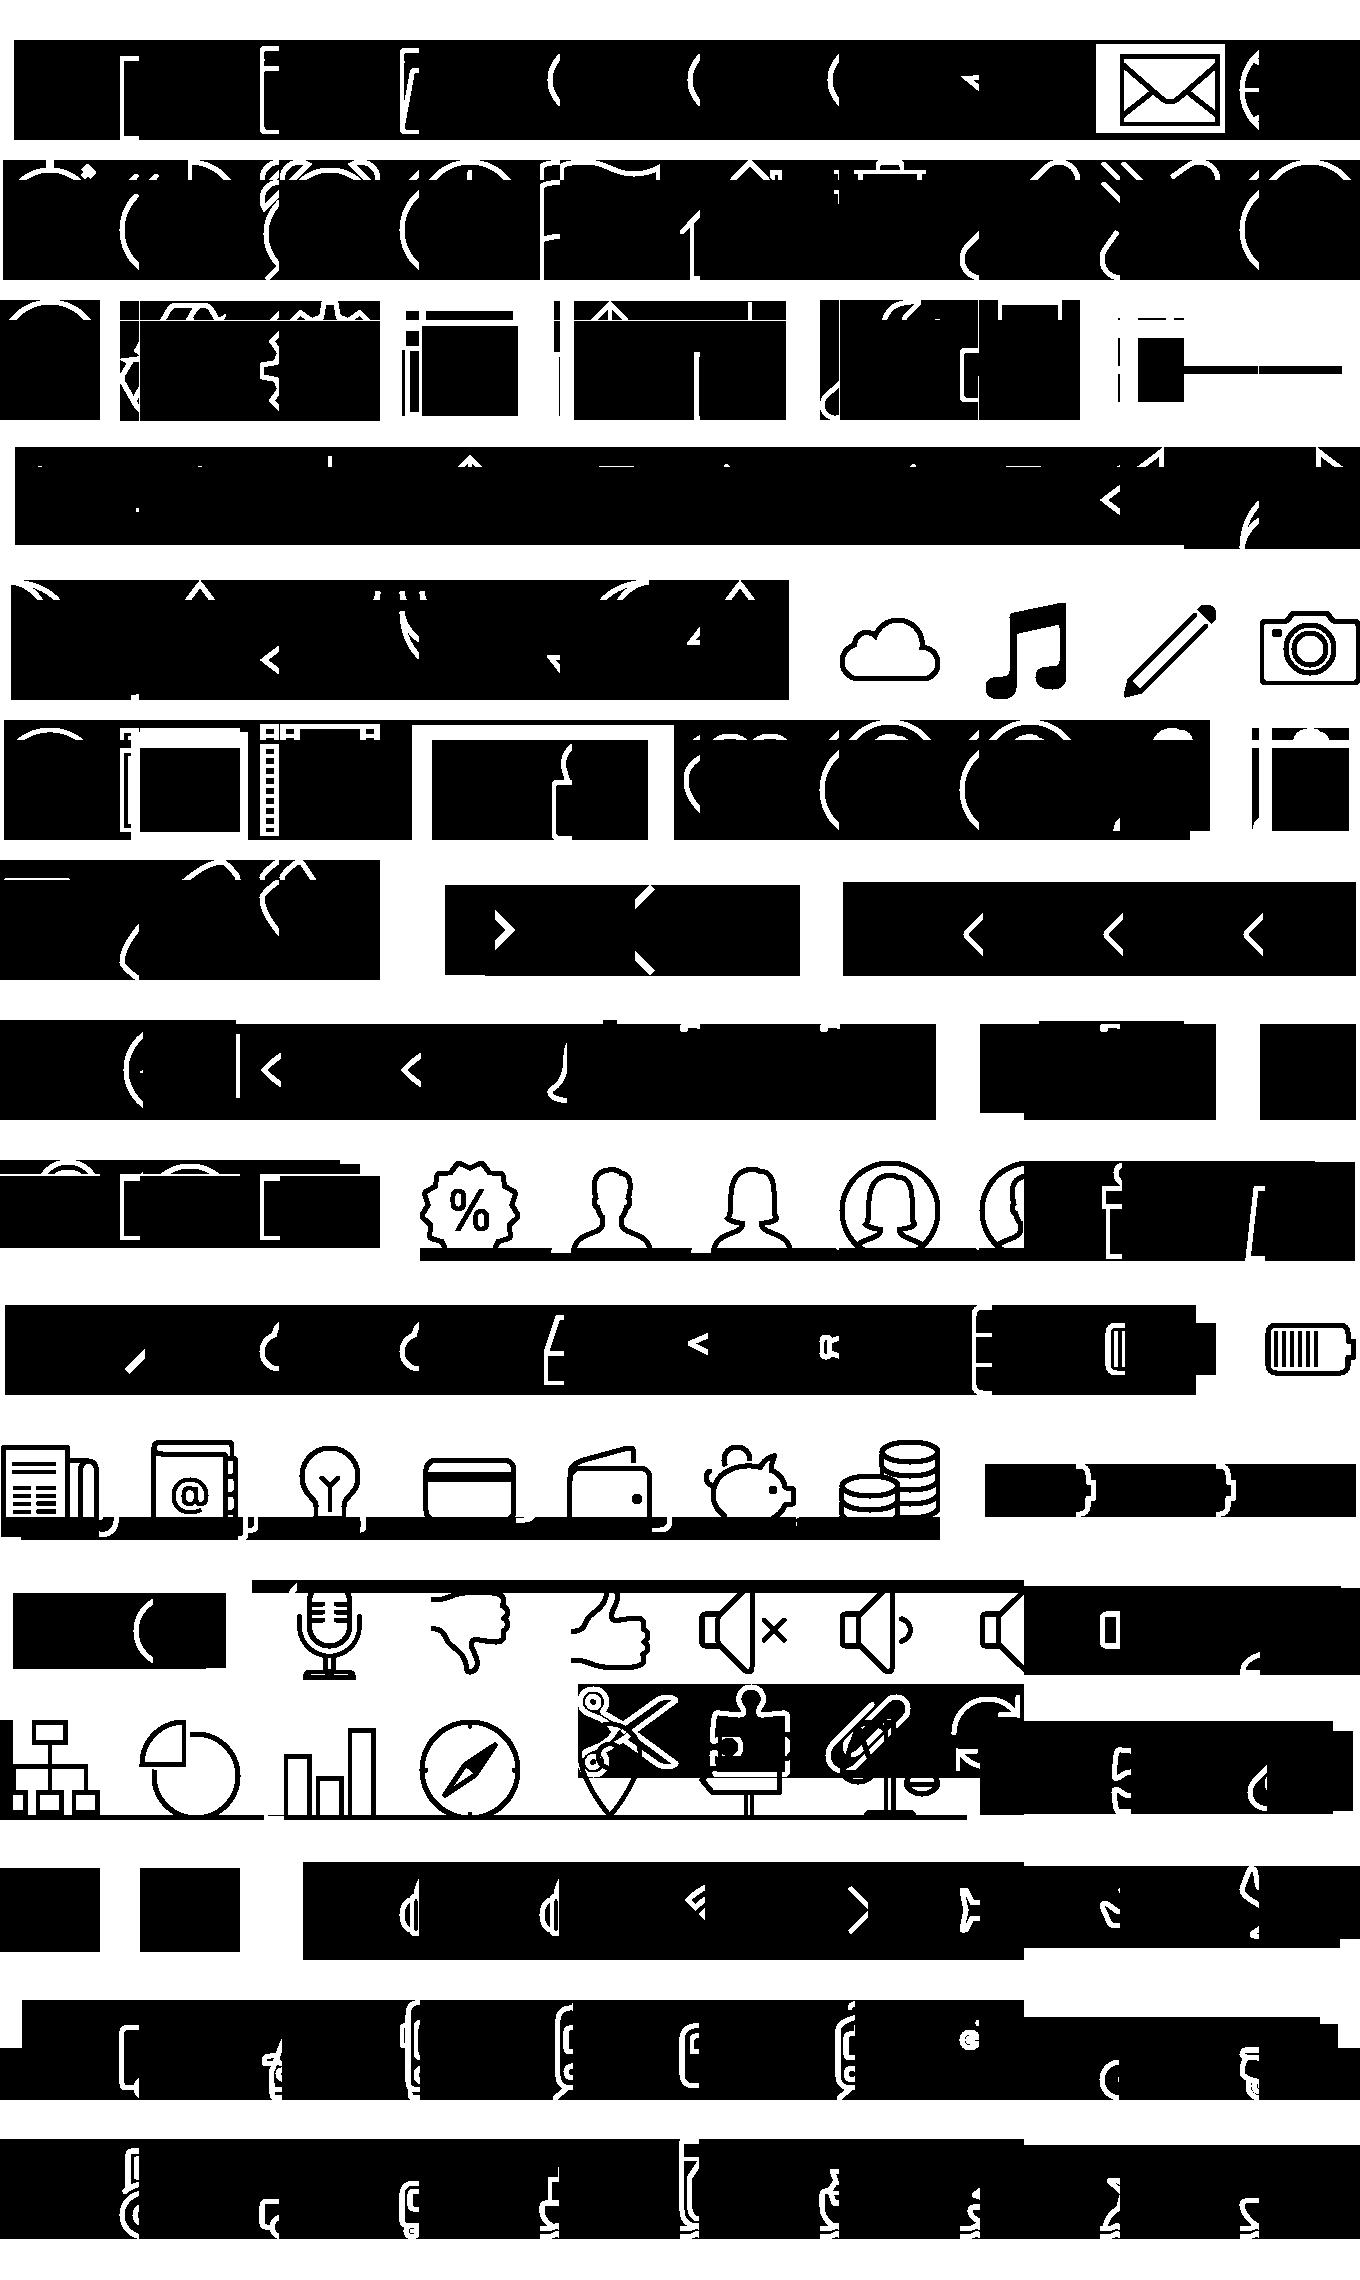 Free iOS 7 icons in vector Dibujos garabateados, Libreta